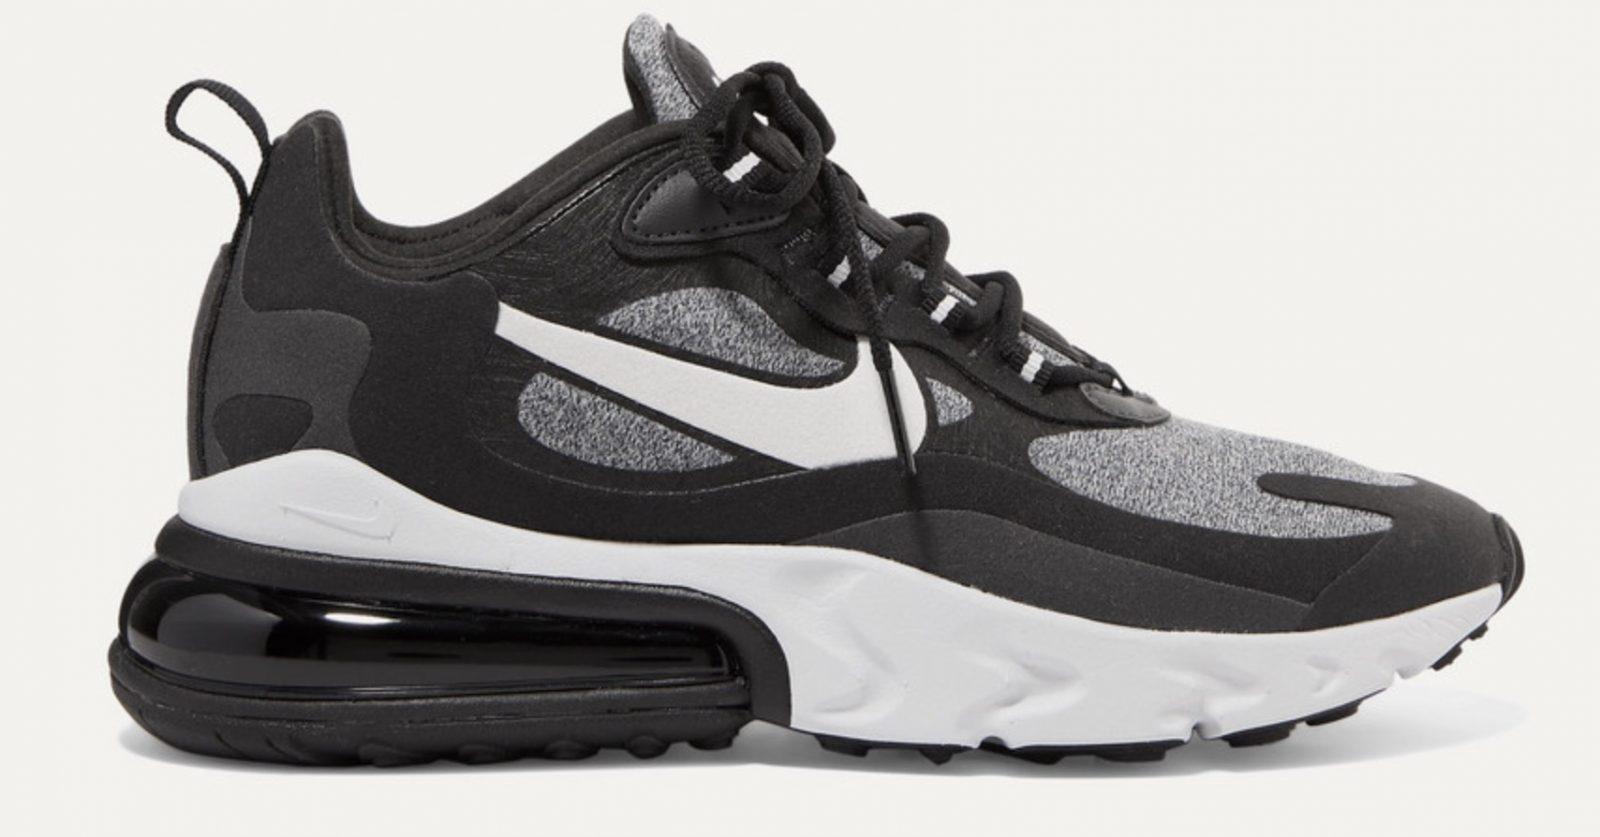 Nike Air Max 270 React Grey Black